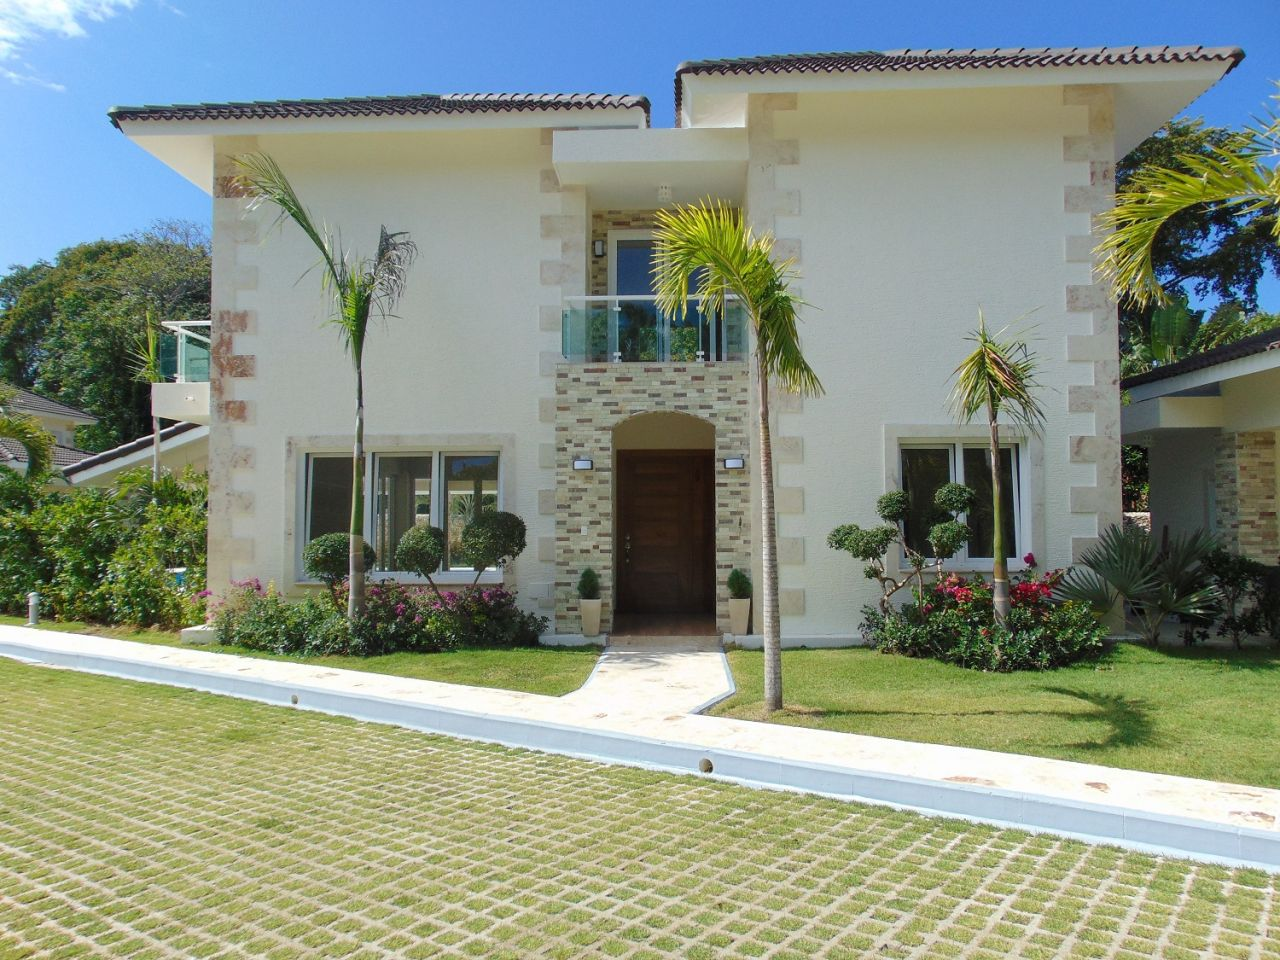 Вилла в Кабарете, Доминиканская Республика, 323 м2 - фото 2